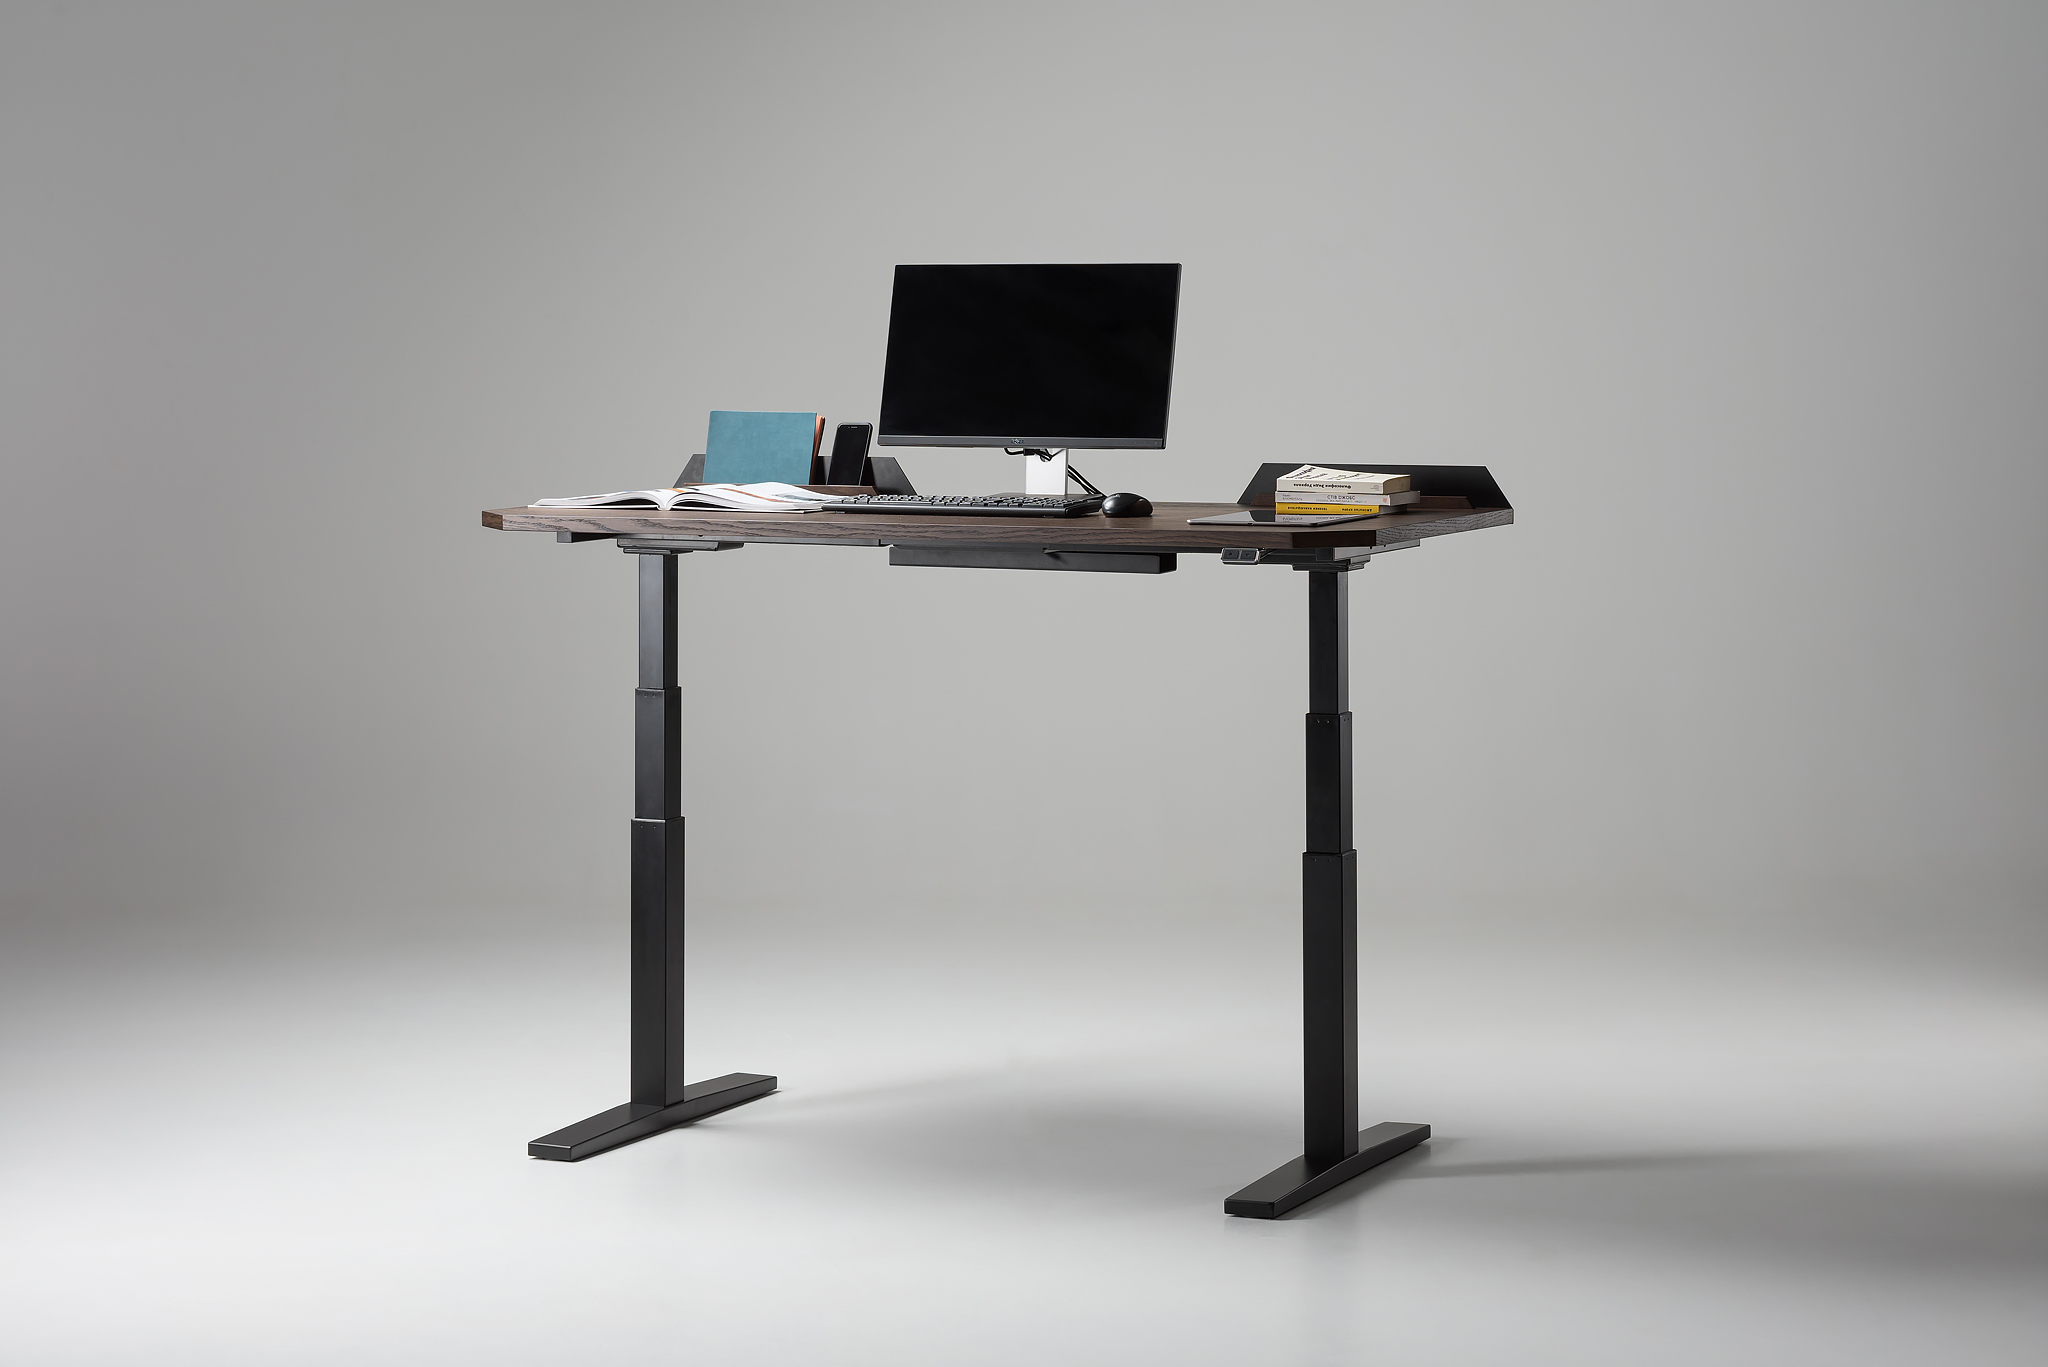 UFO_Lift_Desk (6)